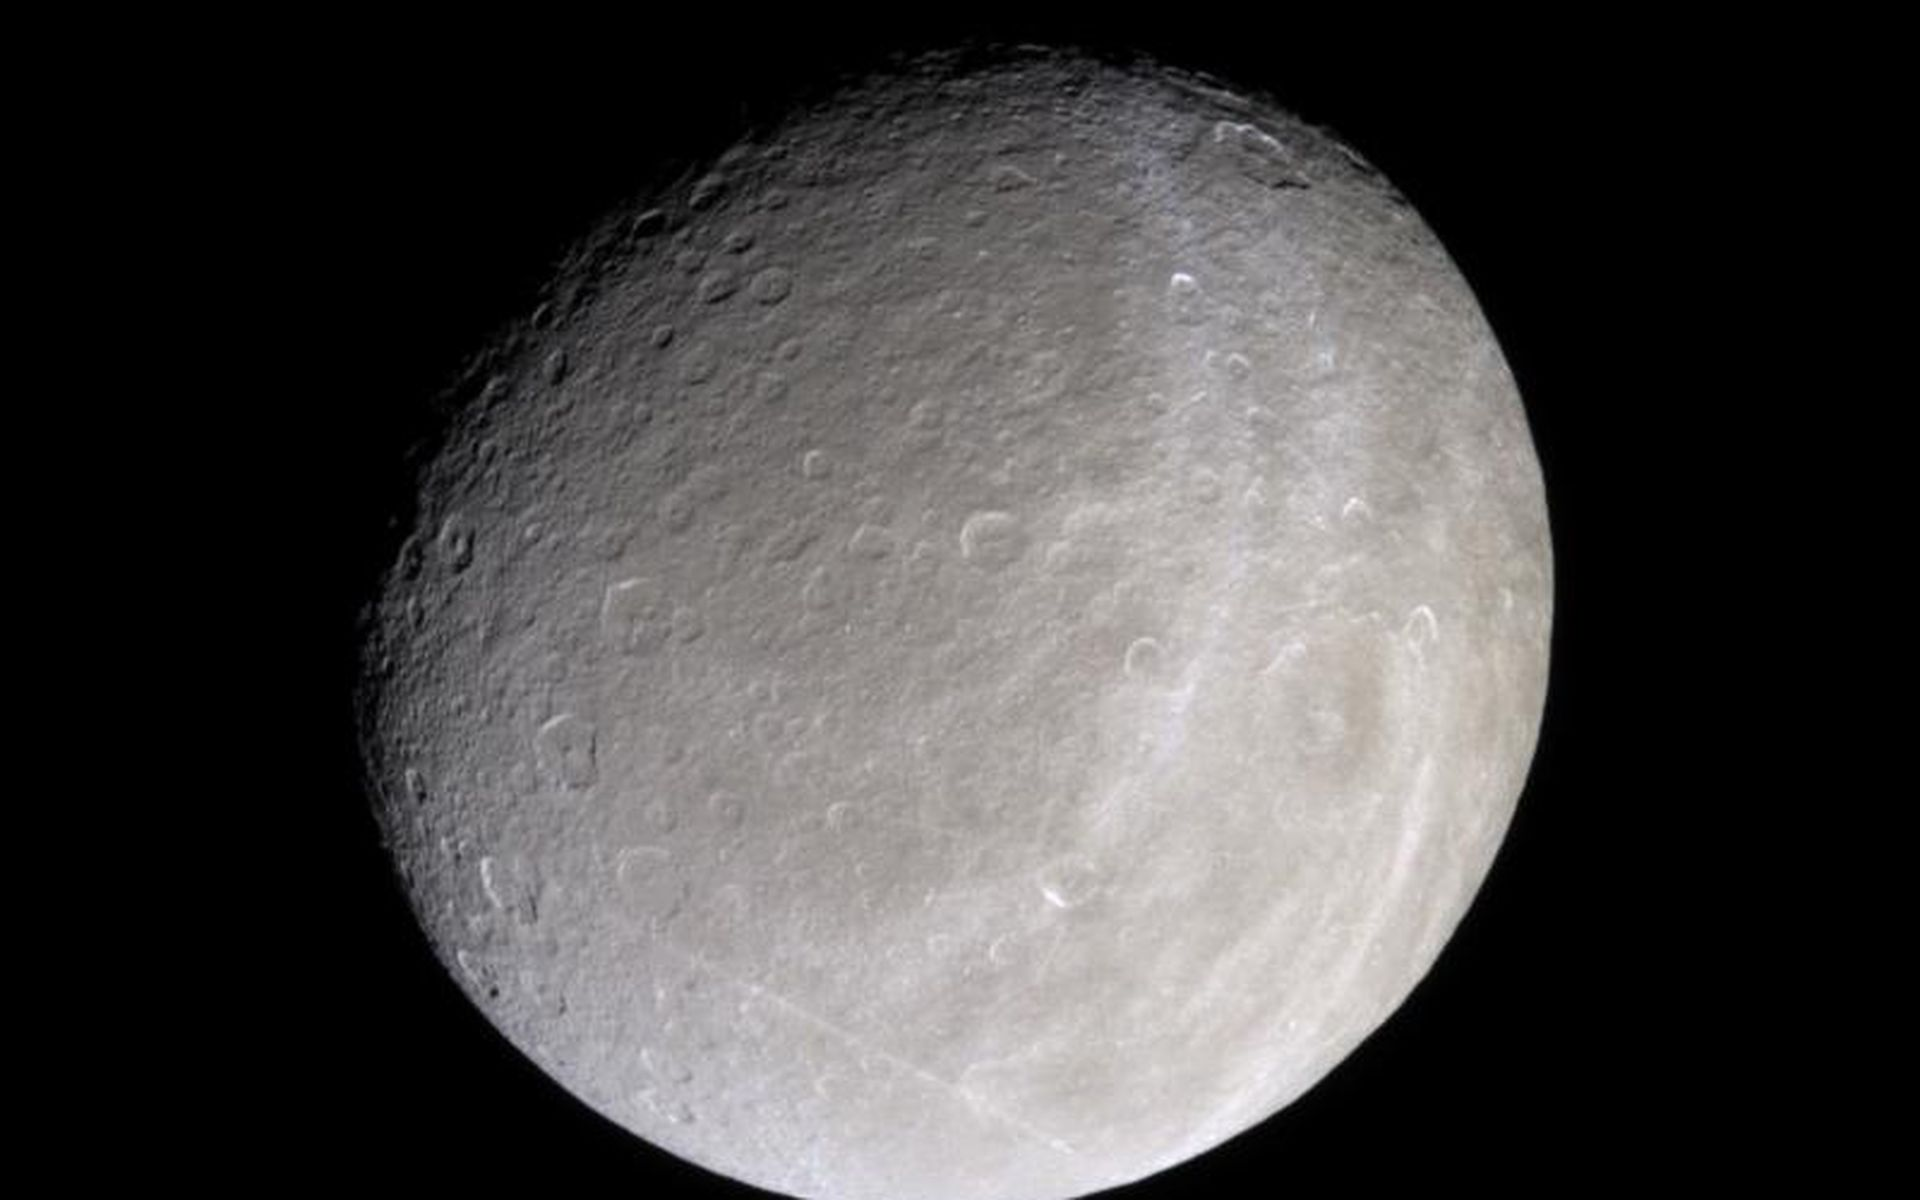 Rhea with brightened wispy terrains! Image credit: NASA/JPL/Space Science Institute